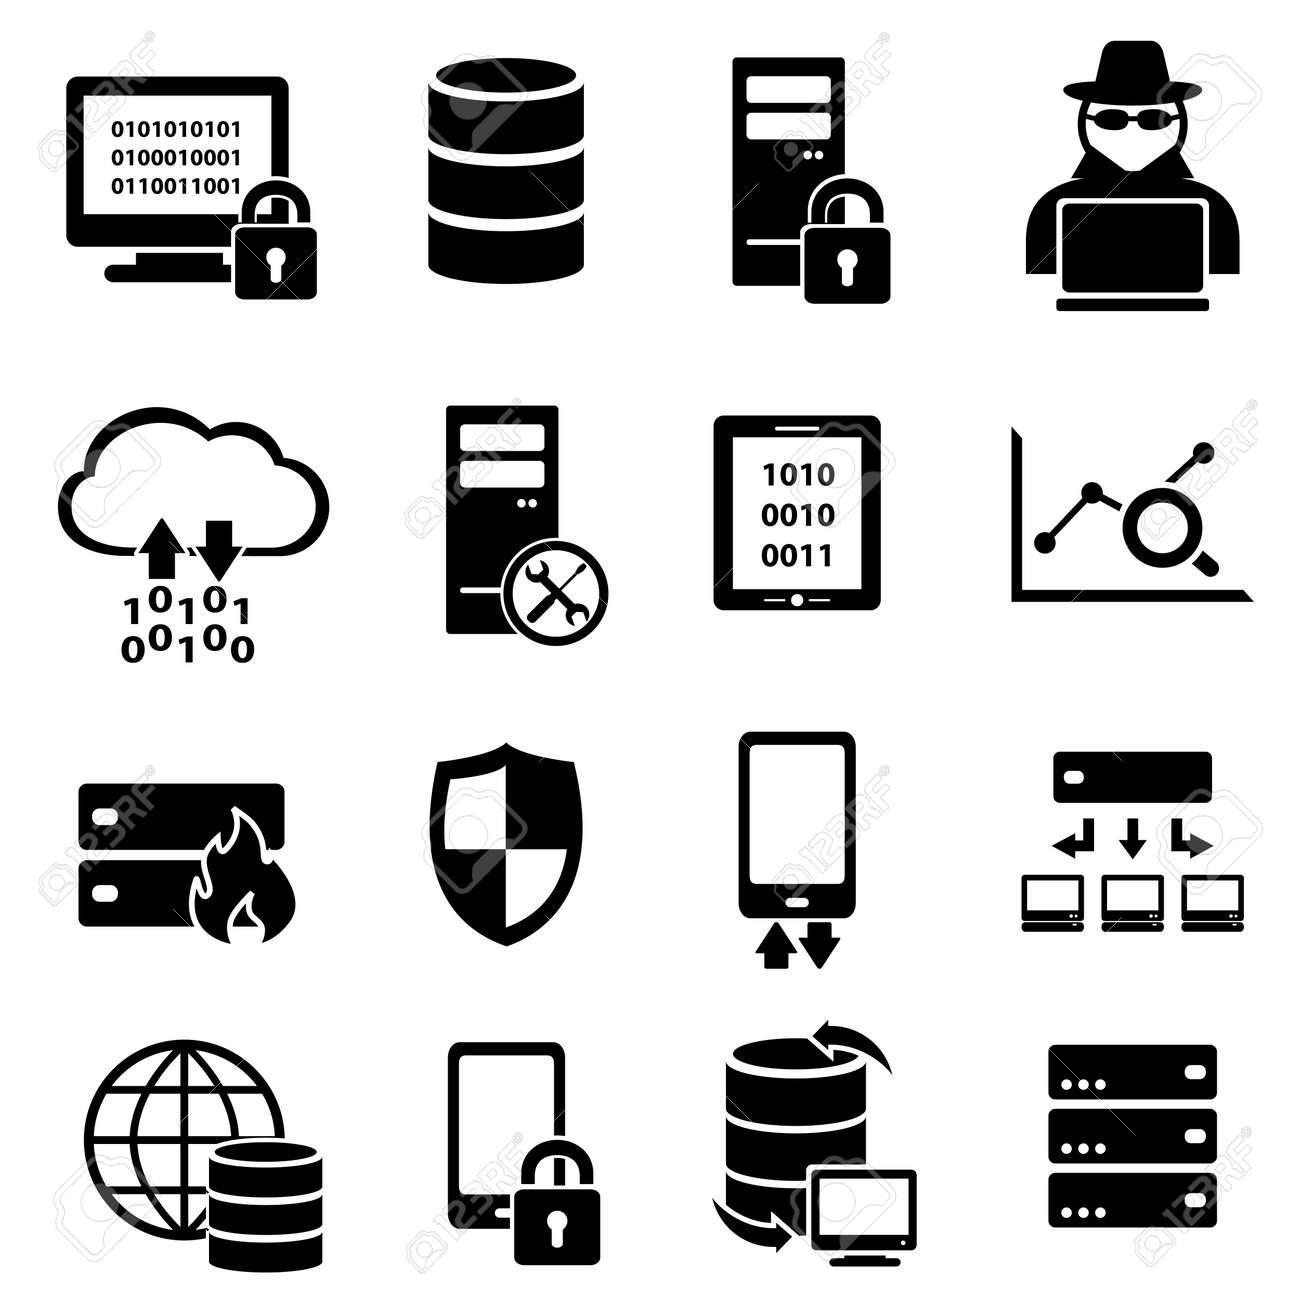 Computer, big data, technology icon set - 56698527